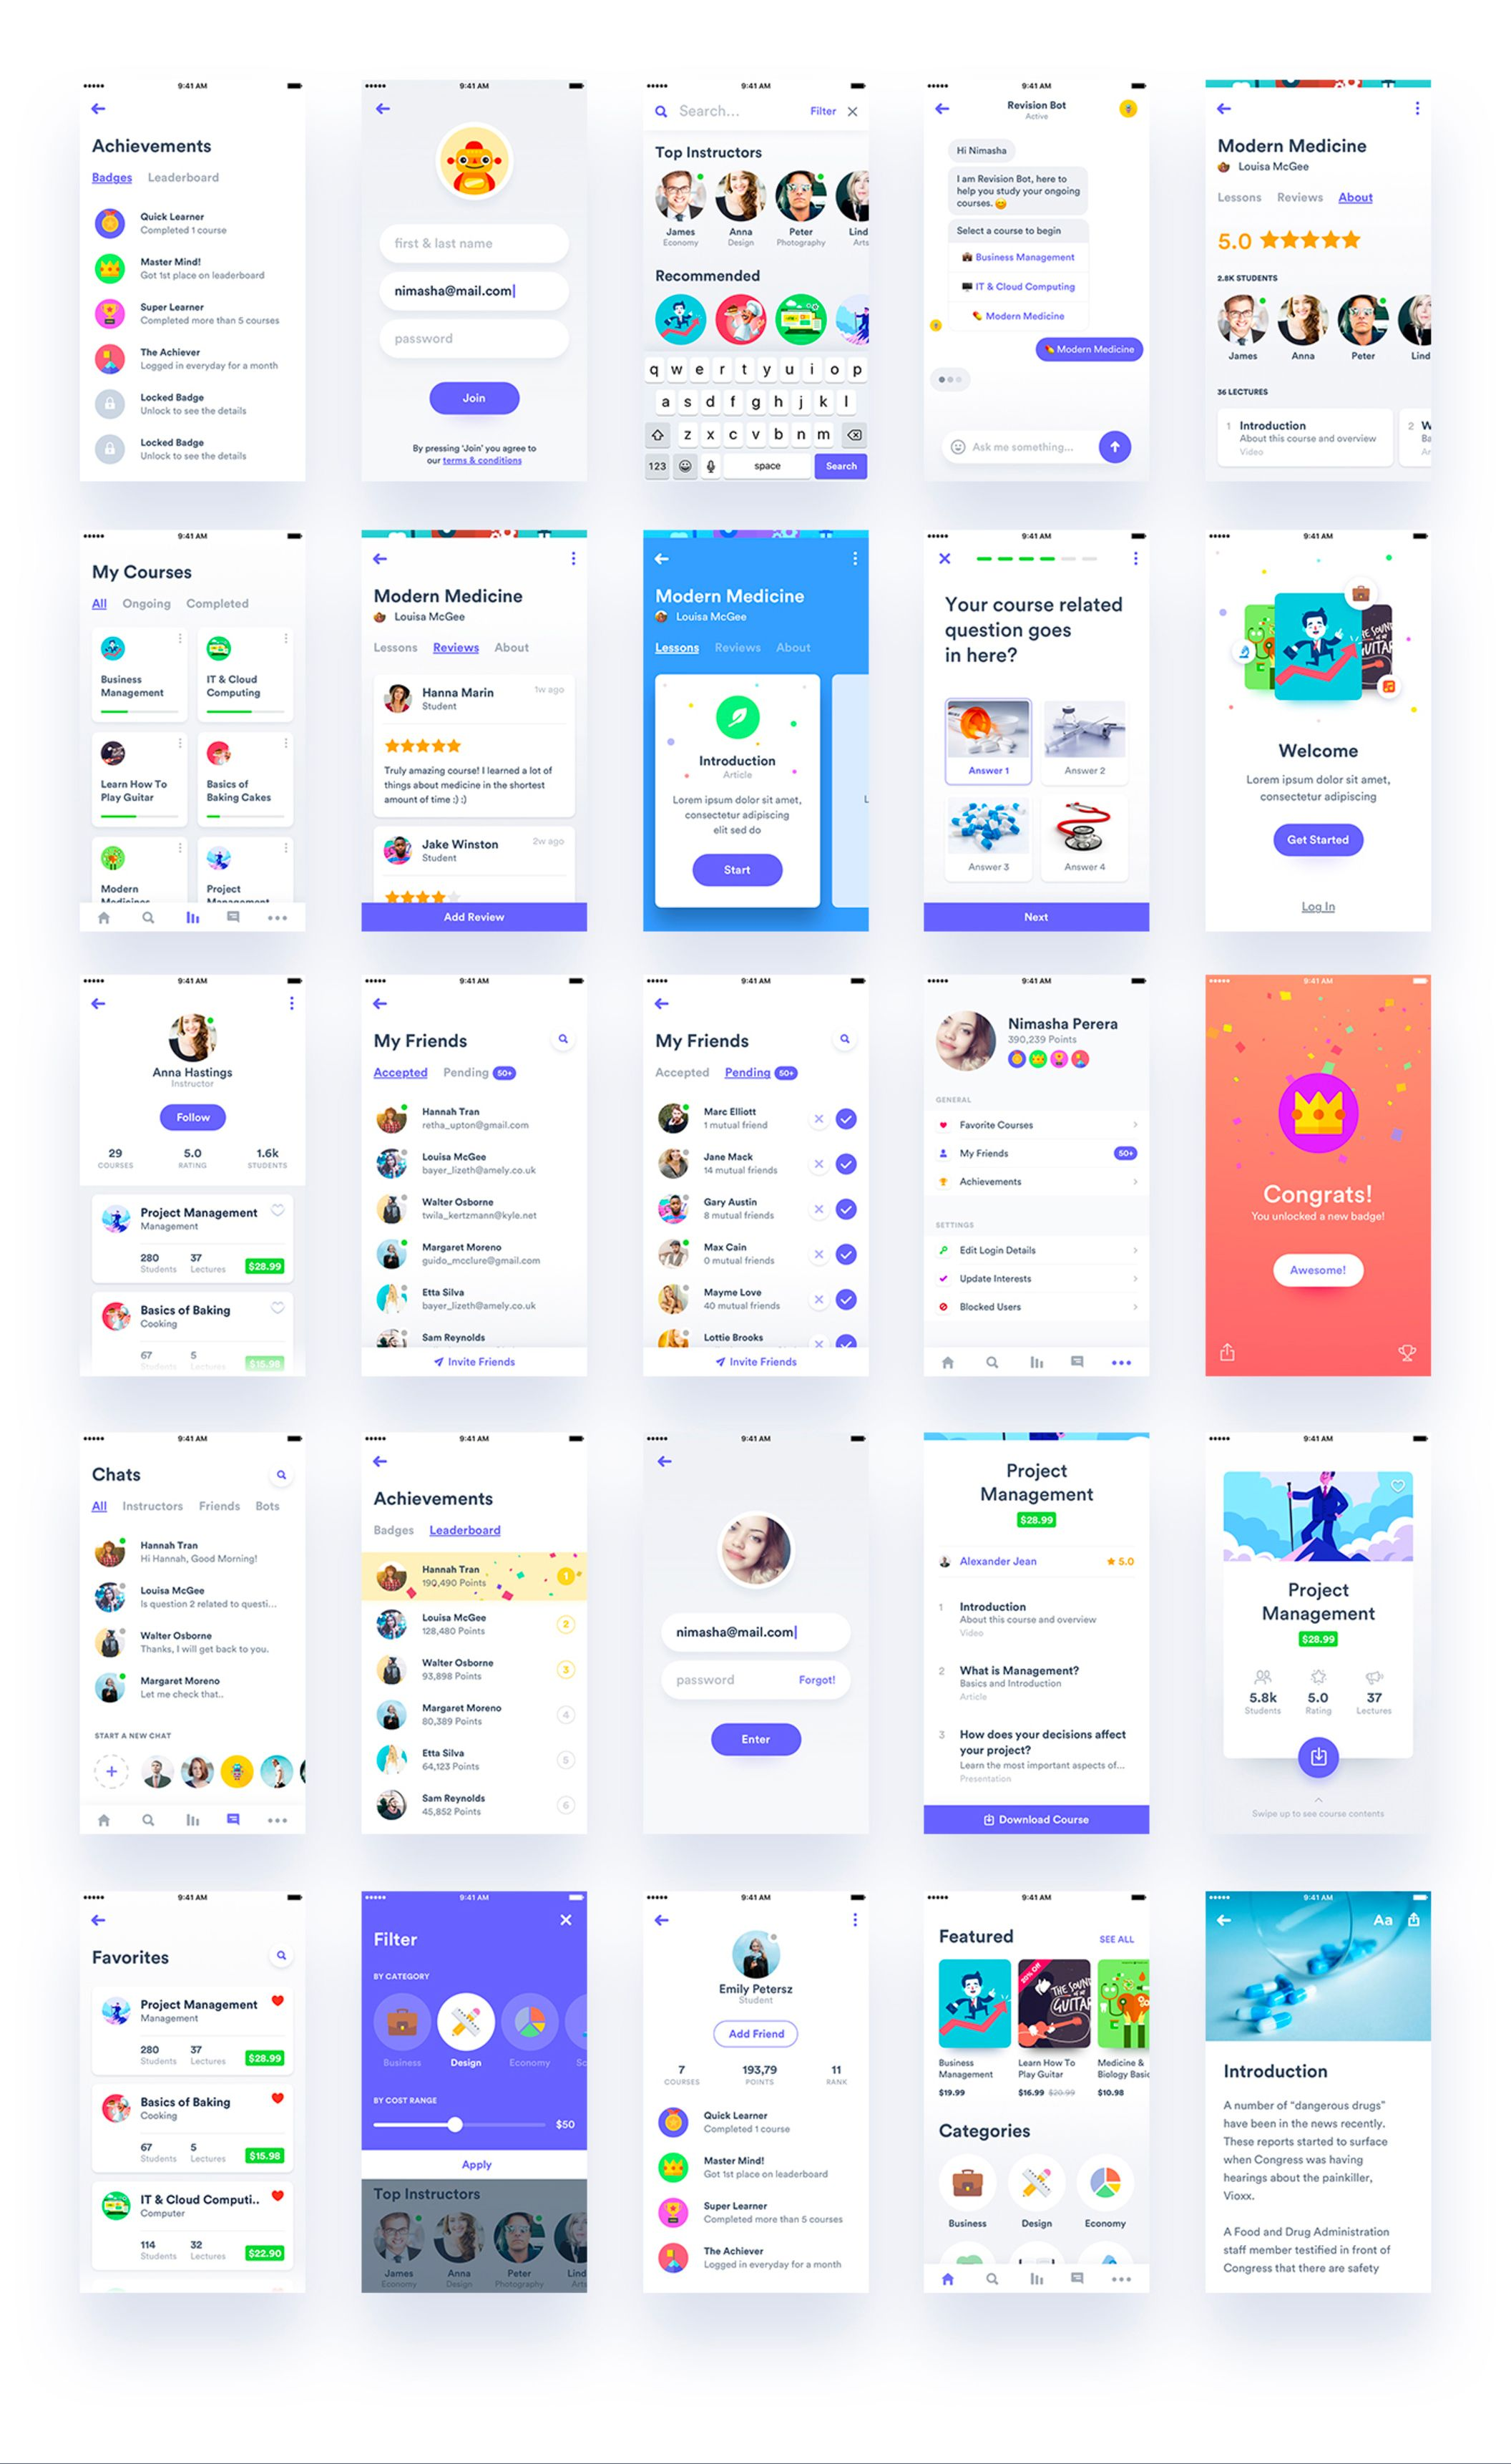 Best Android Ui Design Tool: The best | Idei de încercat web | Android app design Mobile rh:pinterest.com,Design